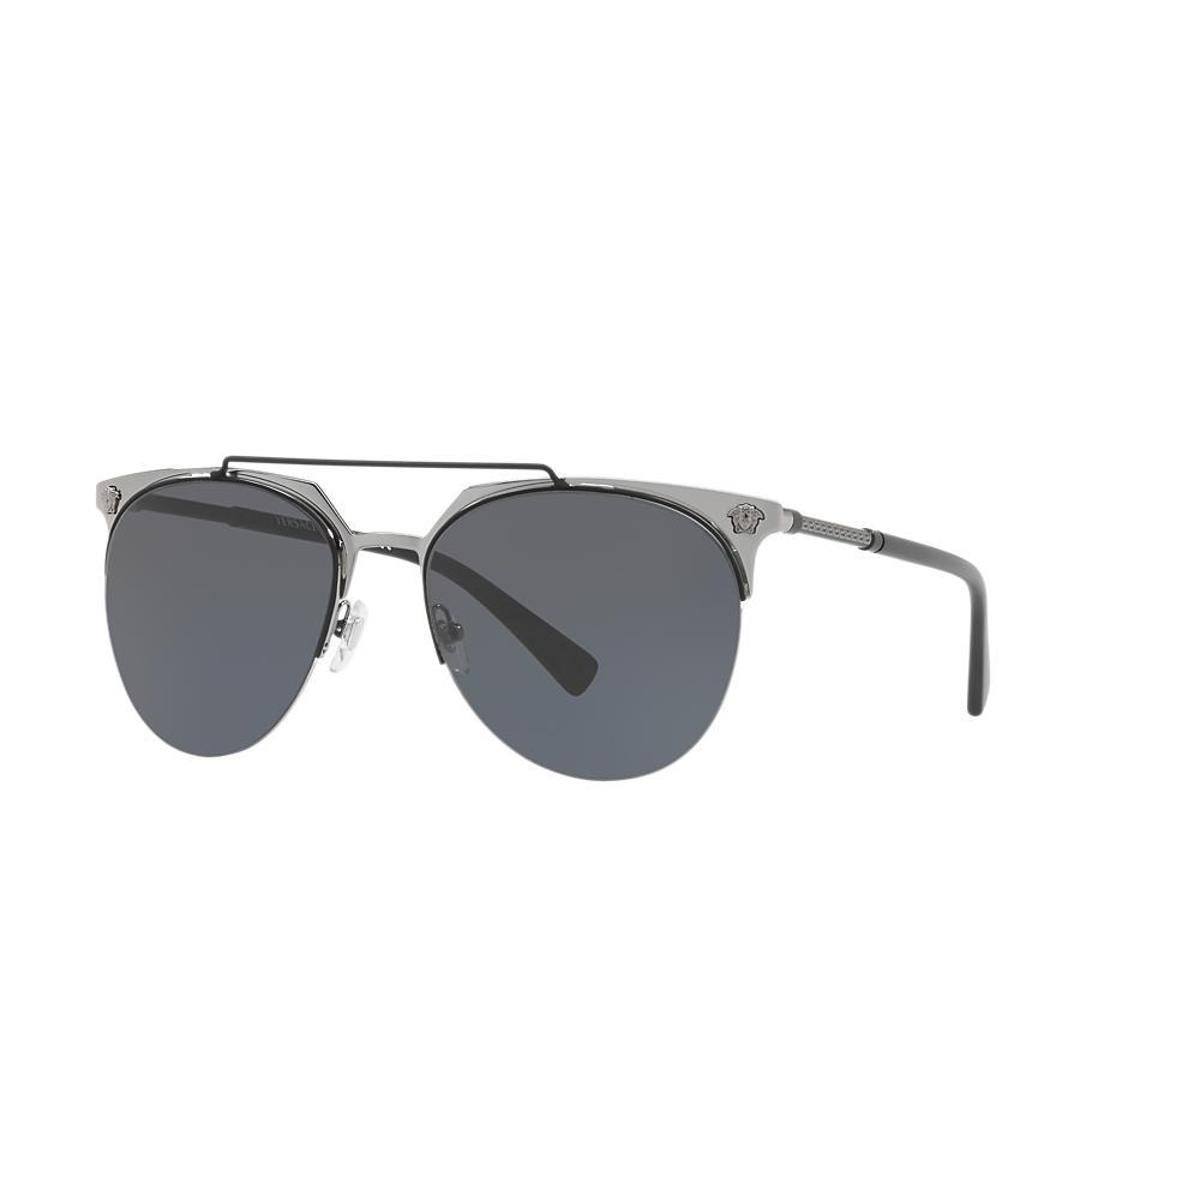 f0d77dd19aac1 Óculos de Sol Versace Piloto VE2181 Masculino - Compre Agora   Zattini